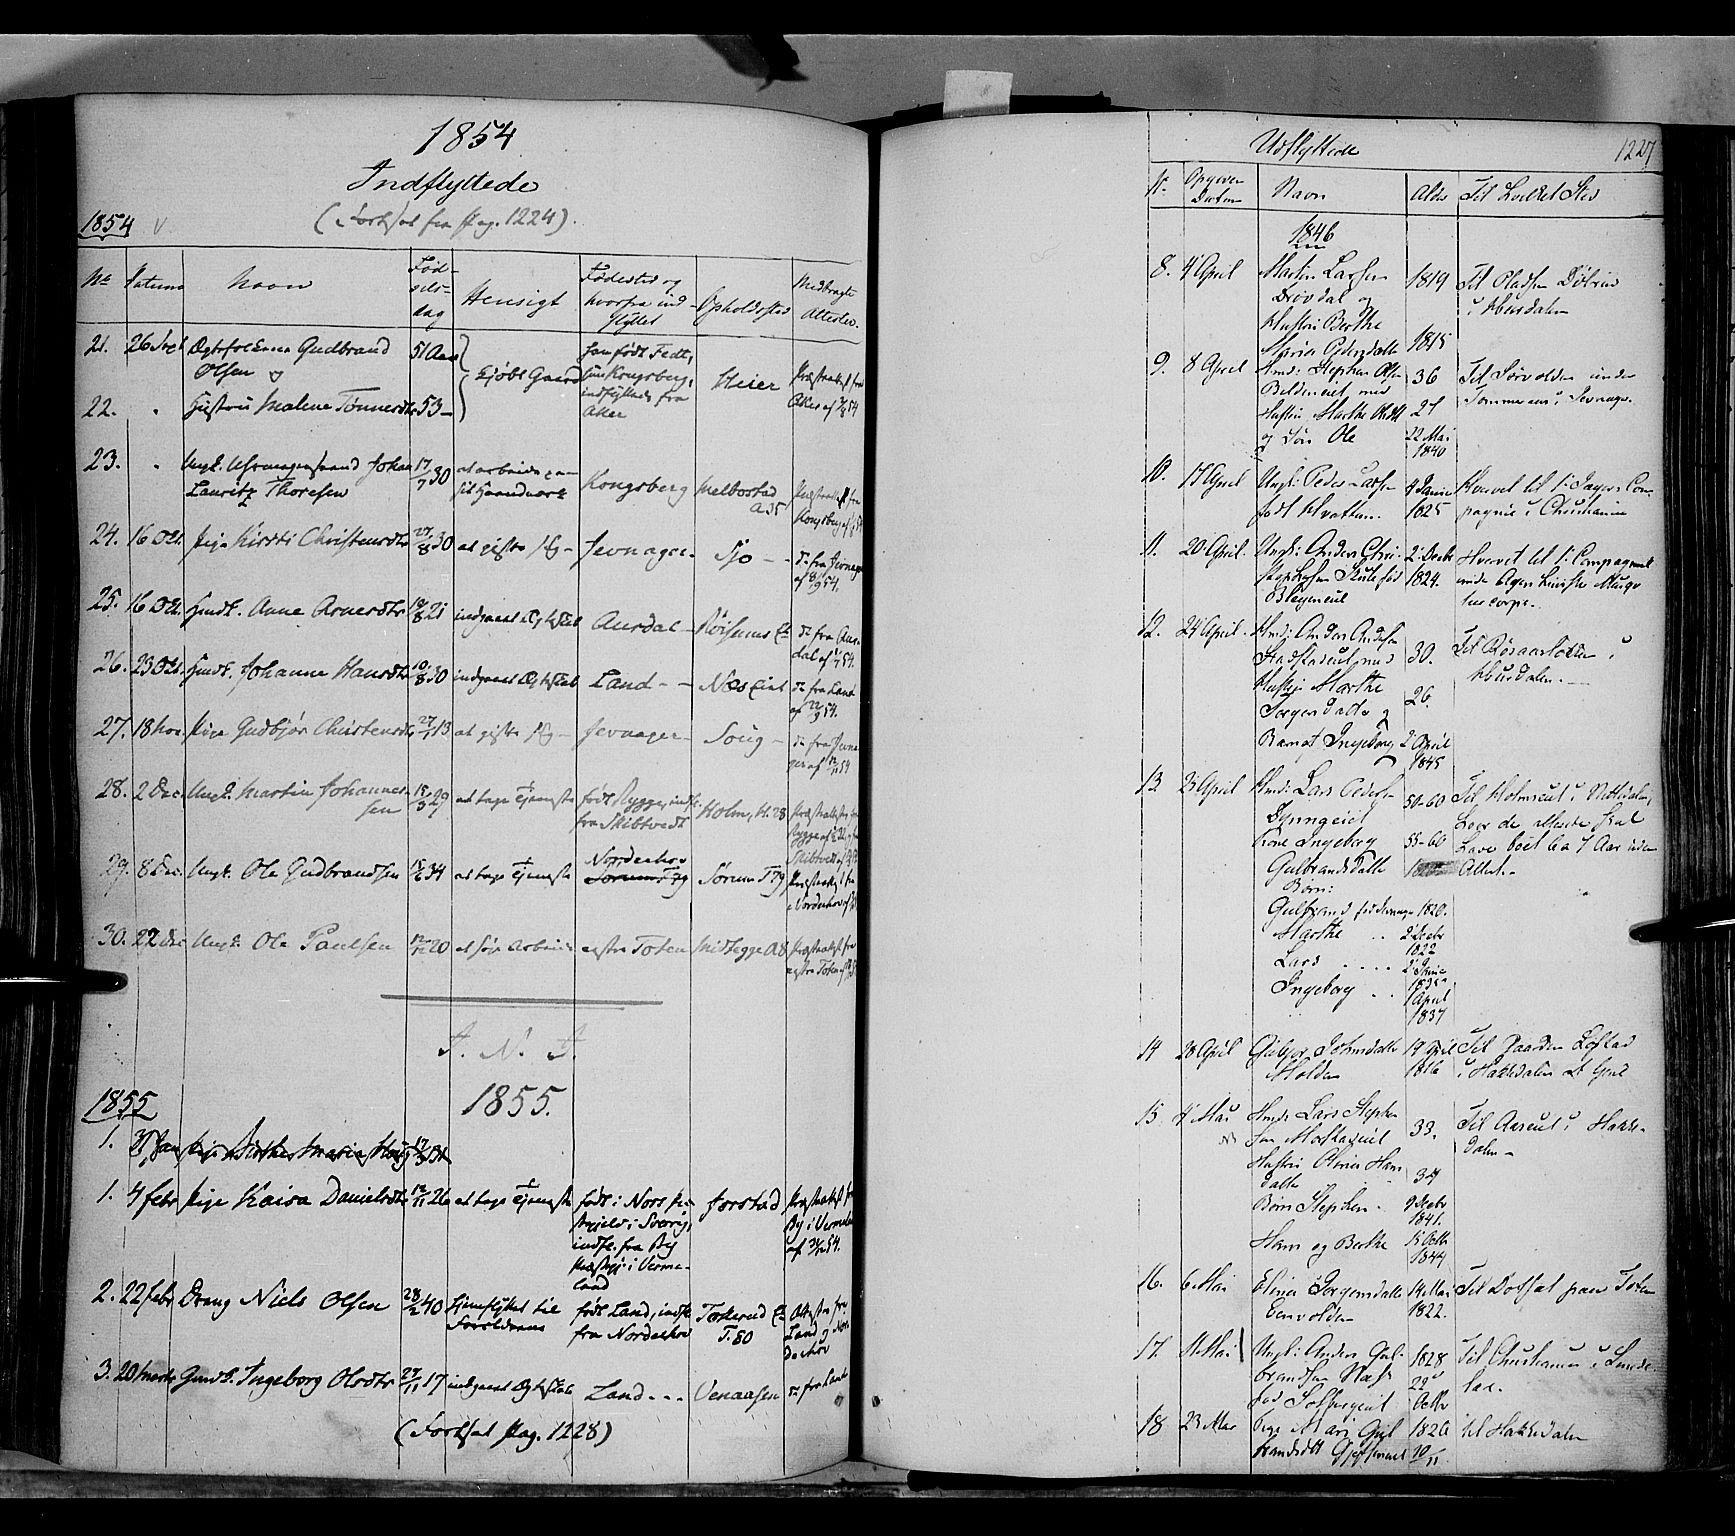 SAH, Gran prestekontor, Ministerialbok nr. 11, 1842-1856, s. 1226-1227